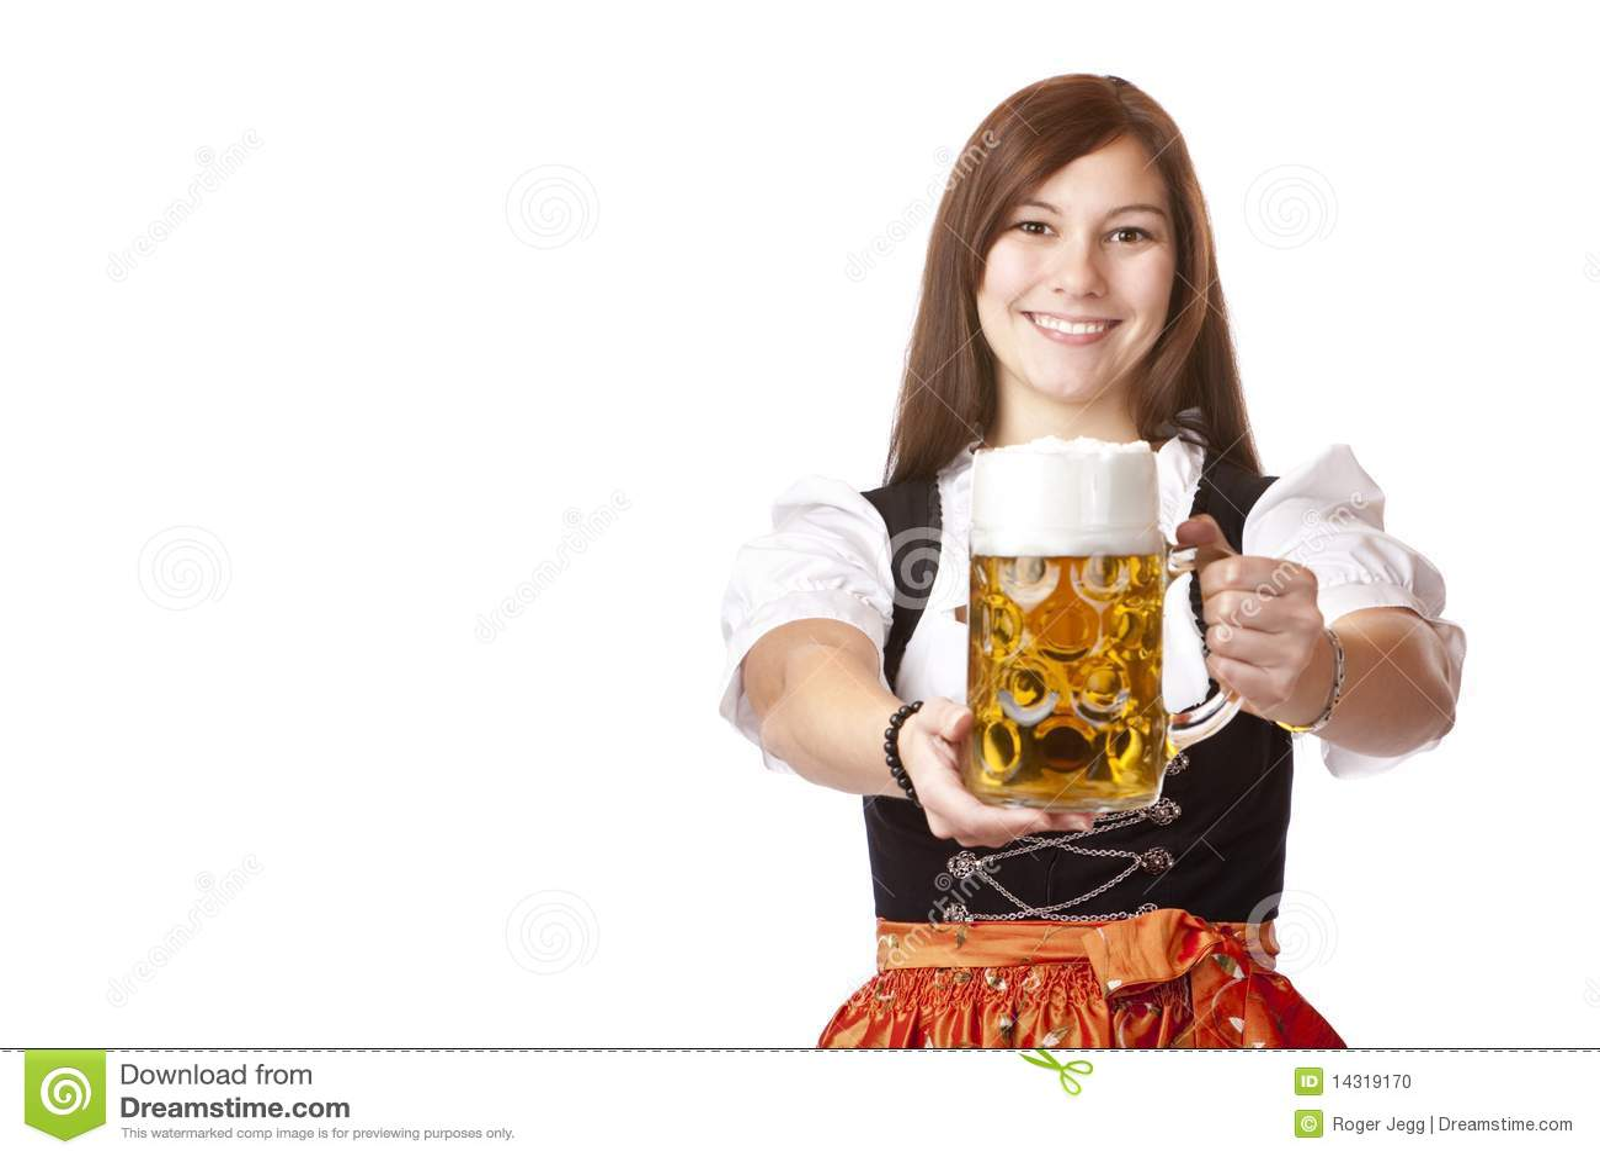 ... Woman Holds Oktoberfest Beer Stein Stock Photo - Image: 14319170